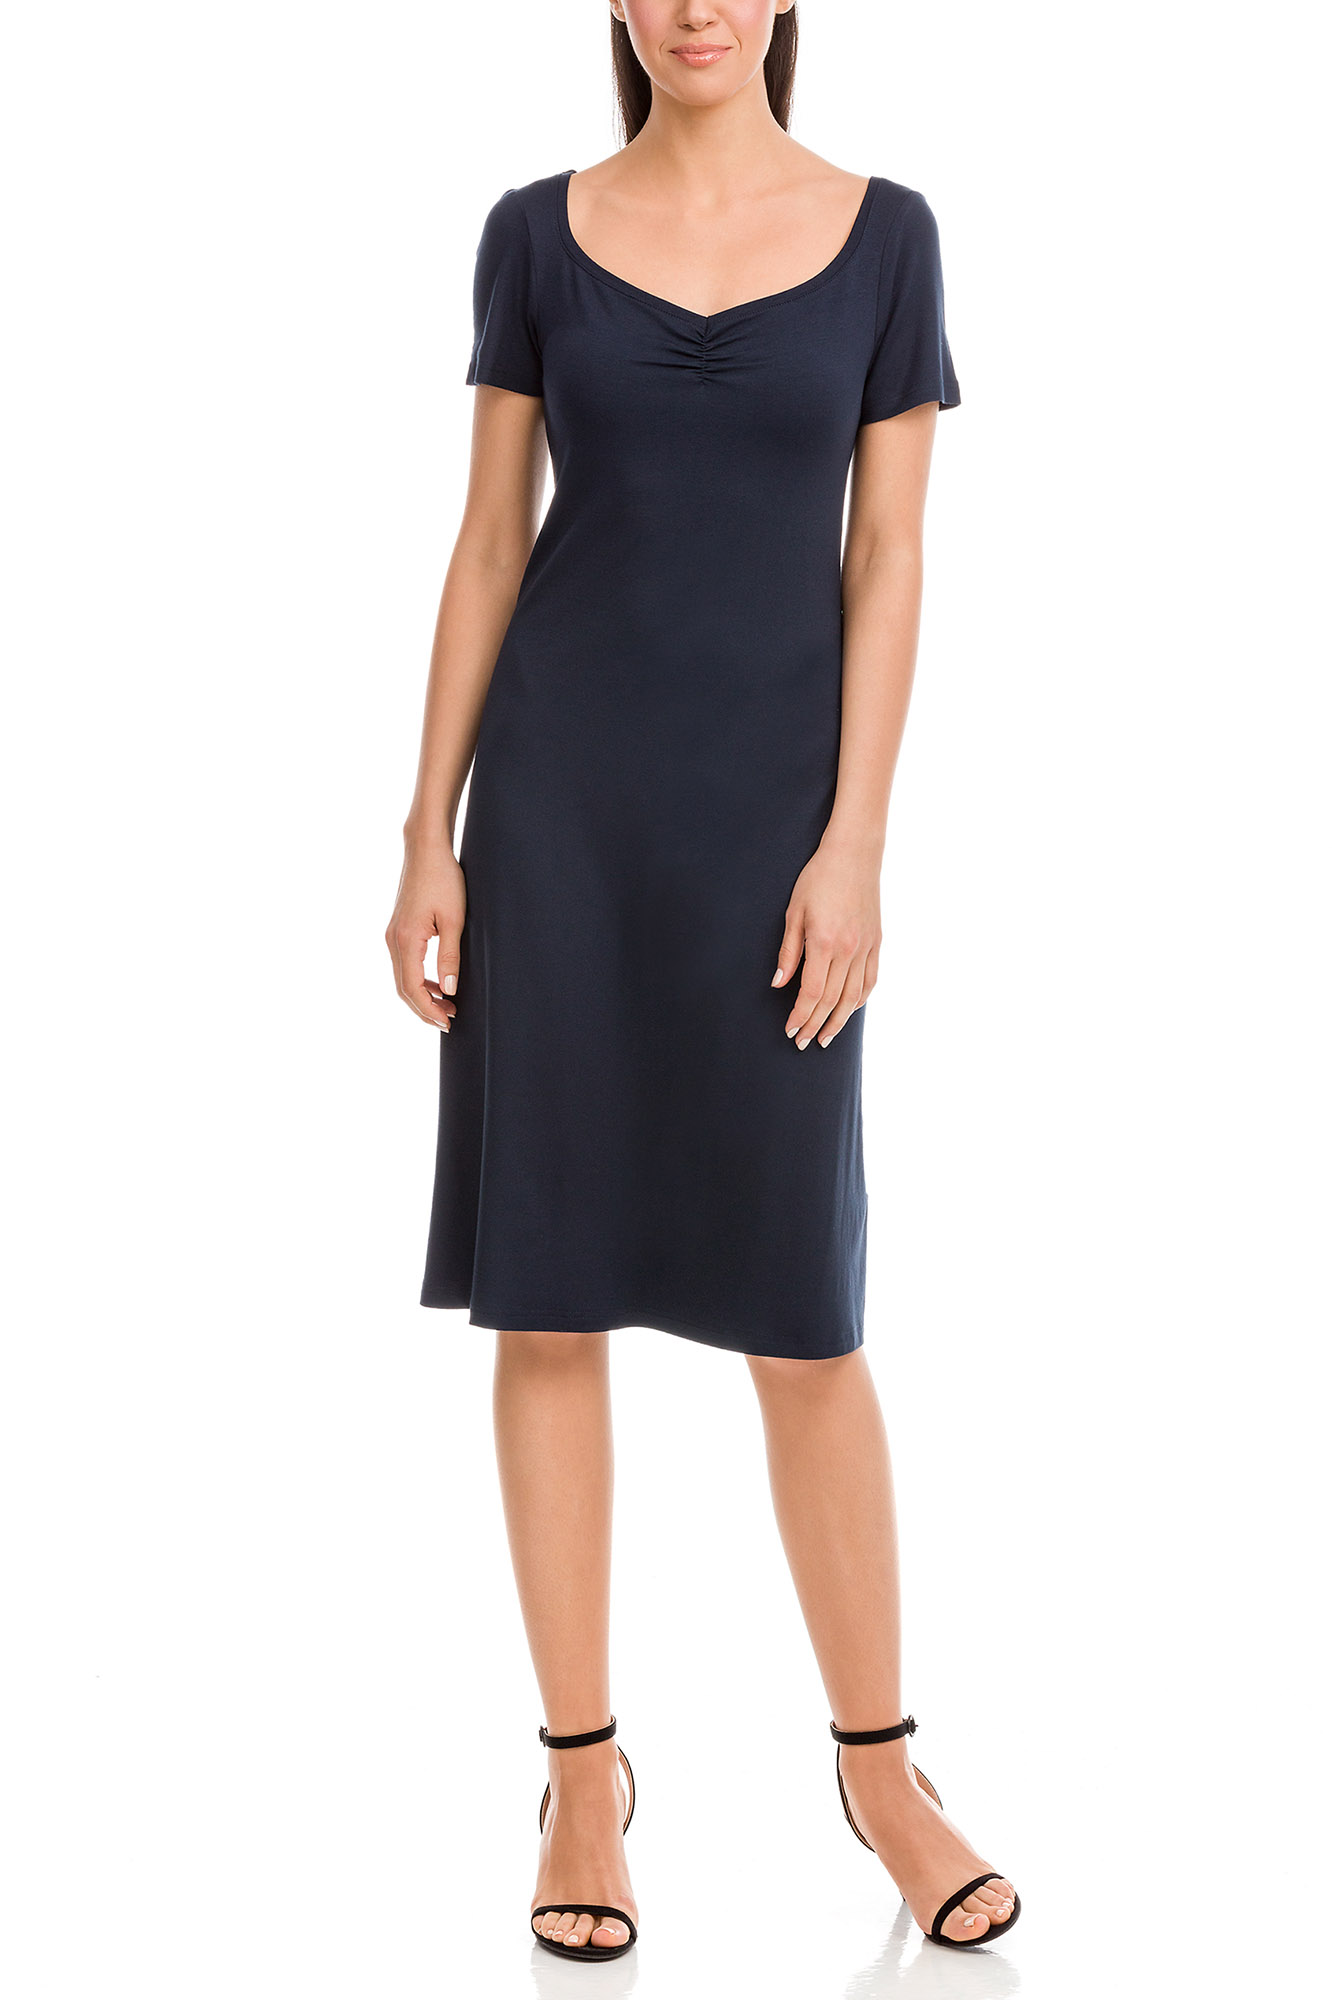 Vamp - Dámske šaty 12567 - Vamp blue xl